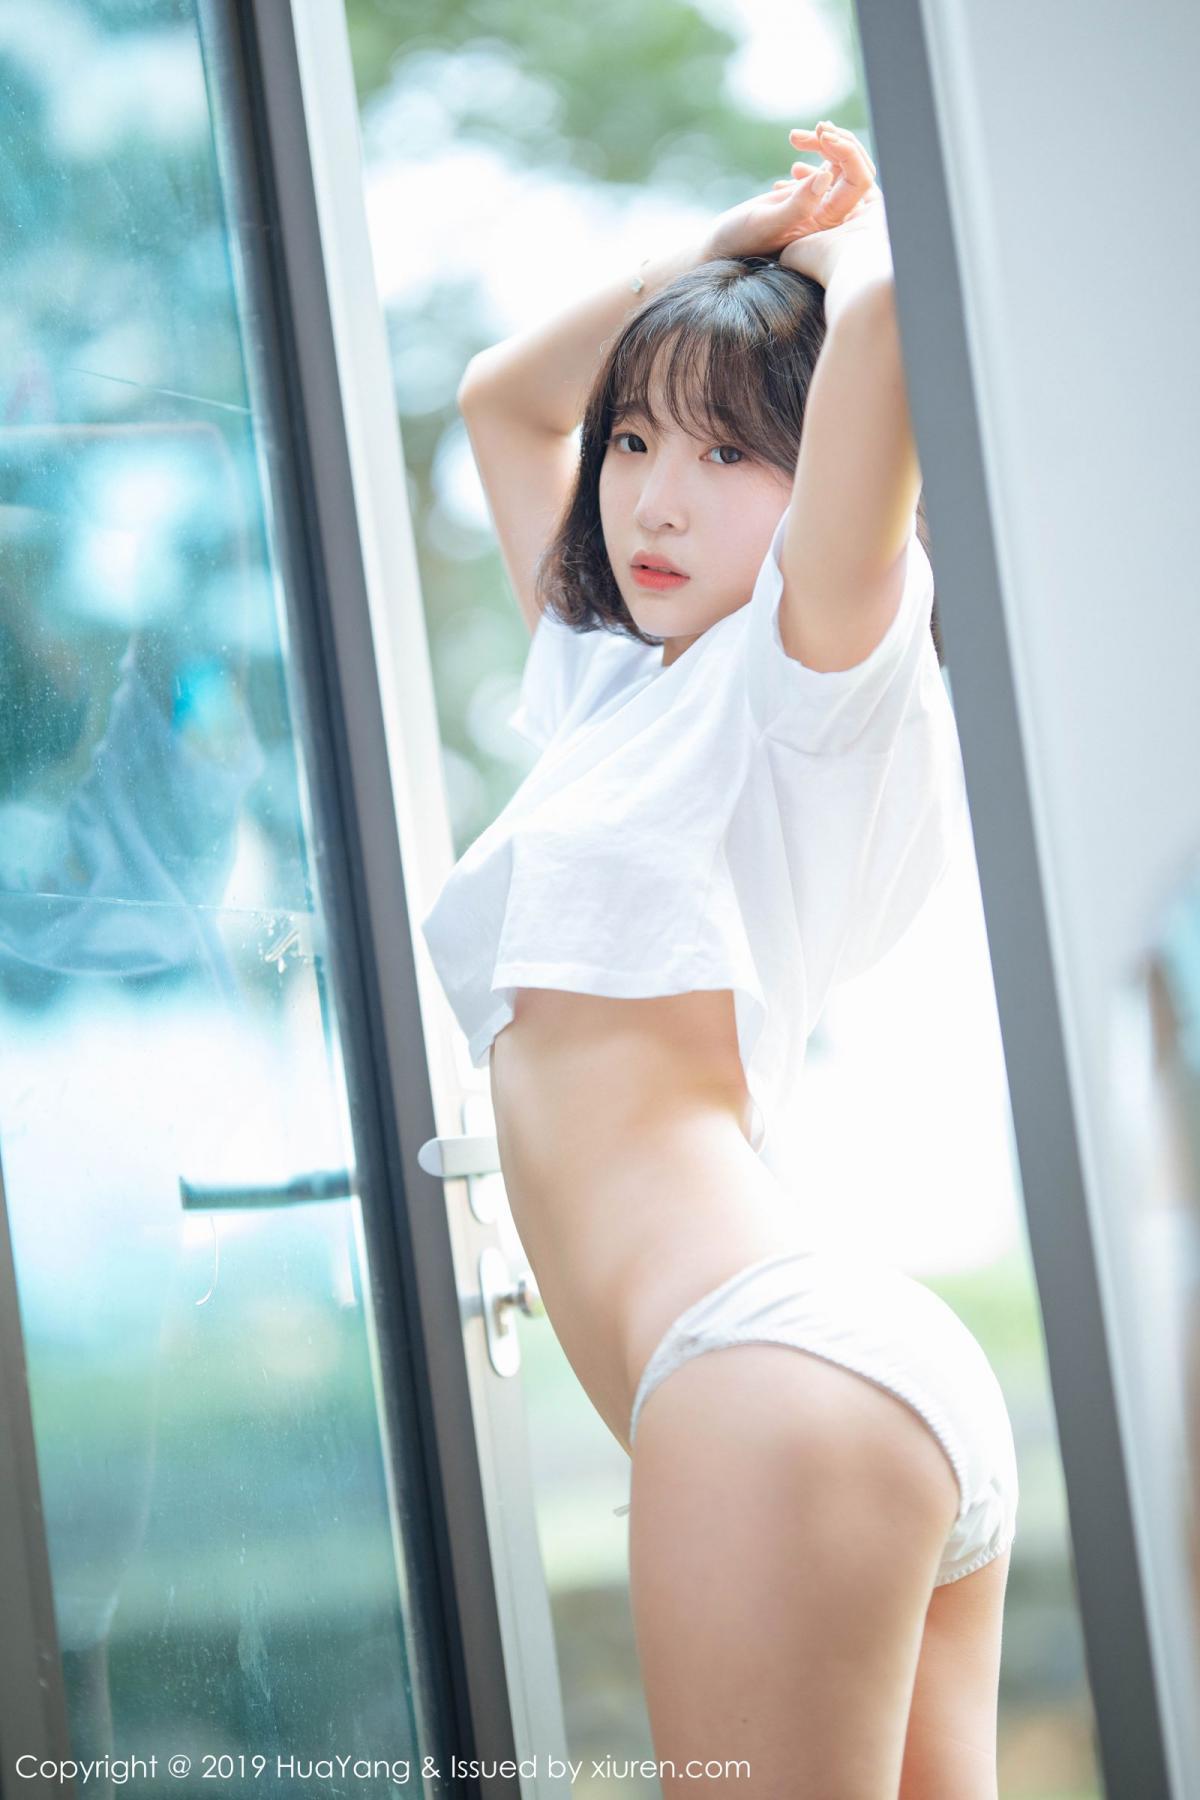 [Huayang] Vol.109 Kang In Kyung 13P, Cool, Fair Skin, HuaYang, Kang In Kyung